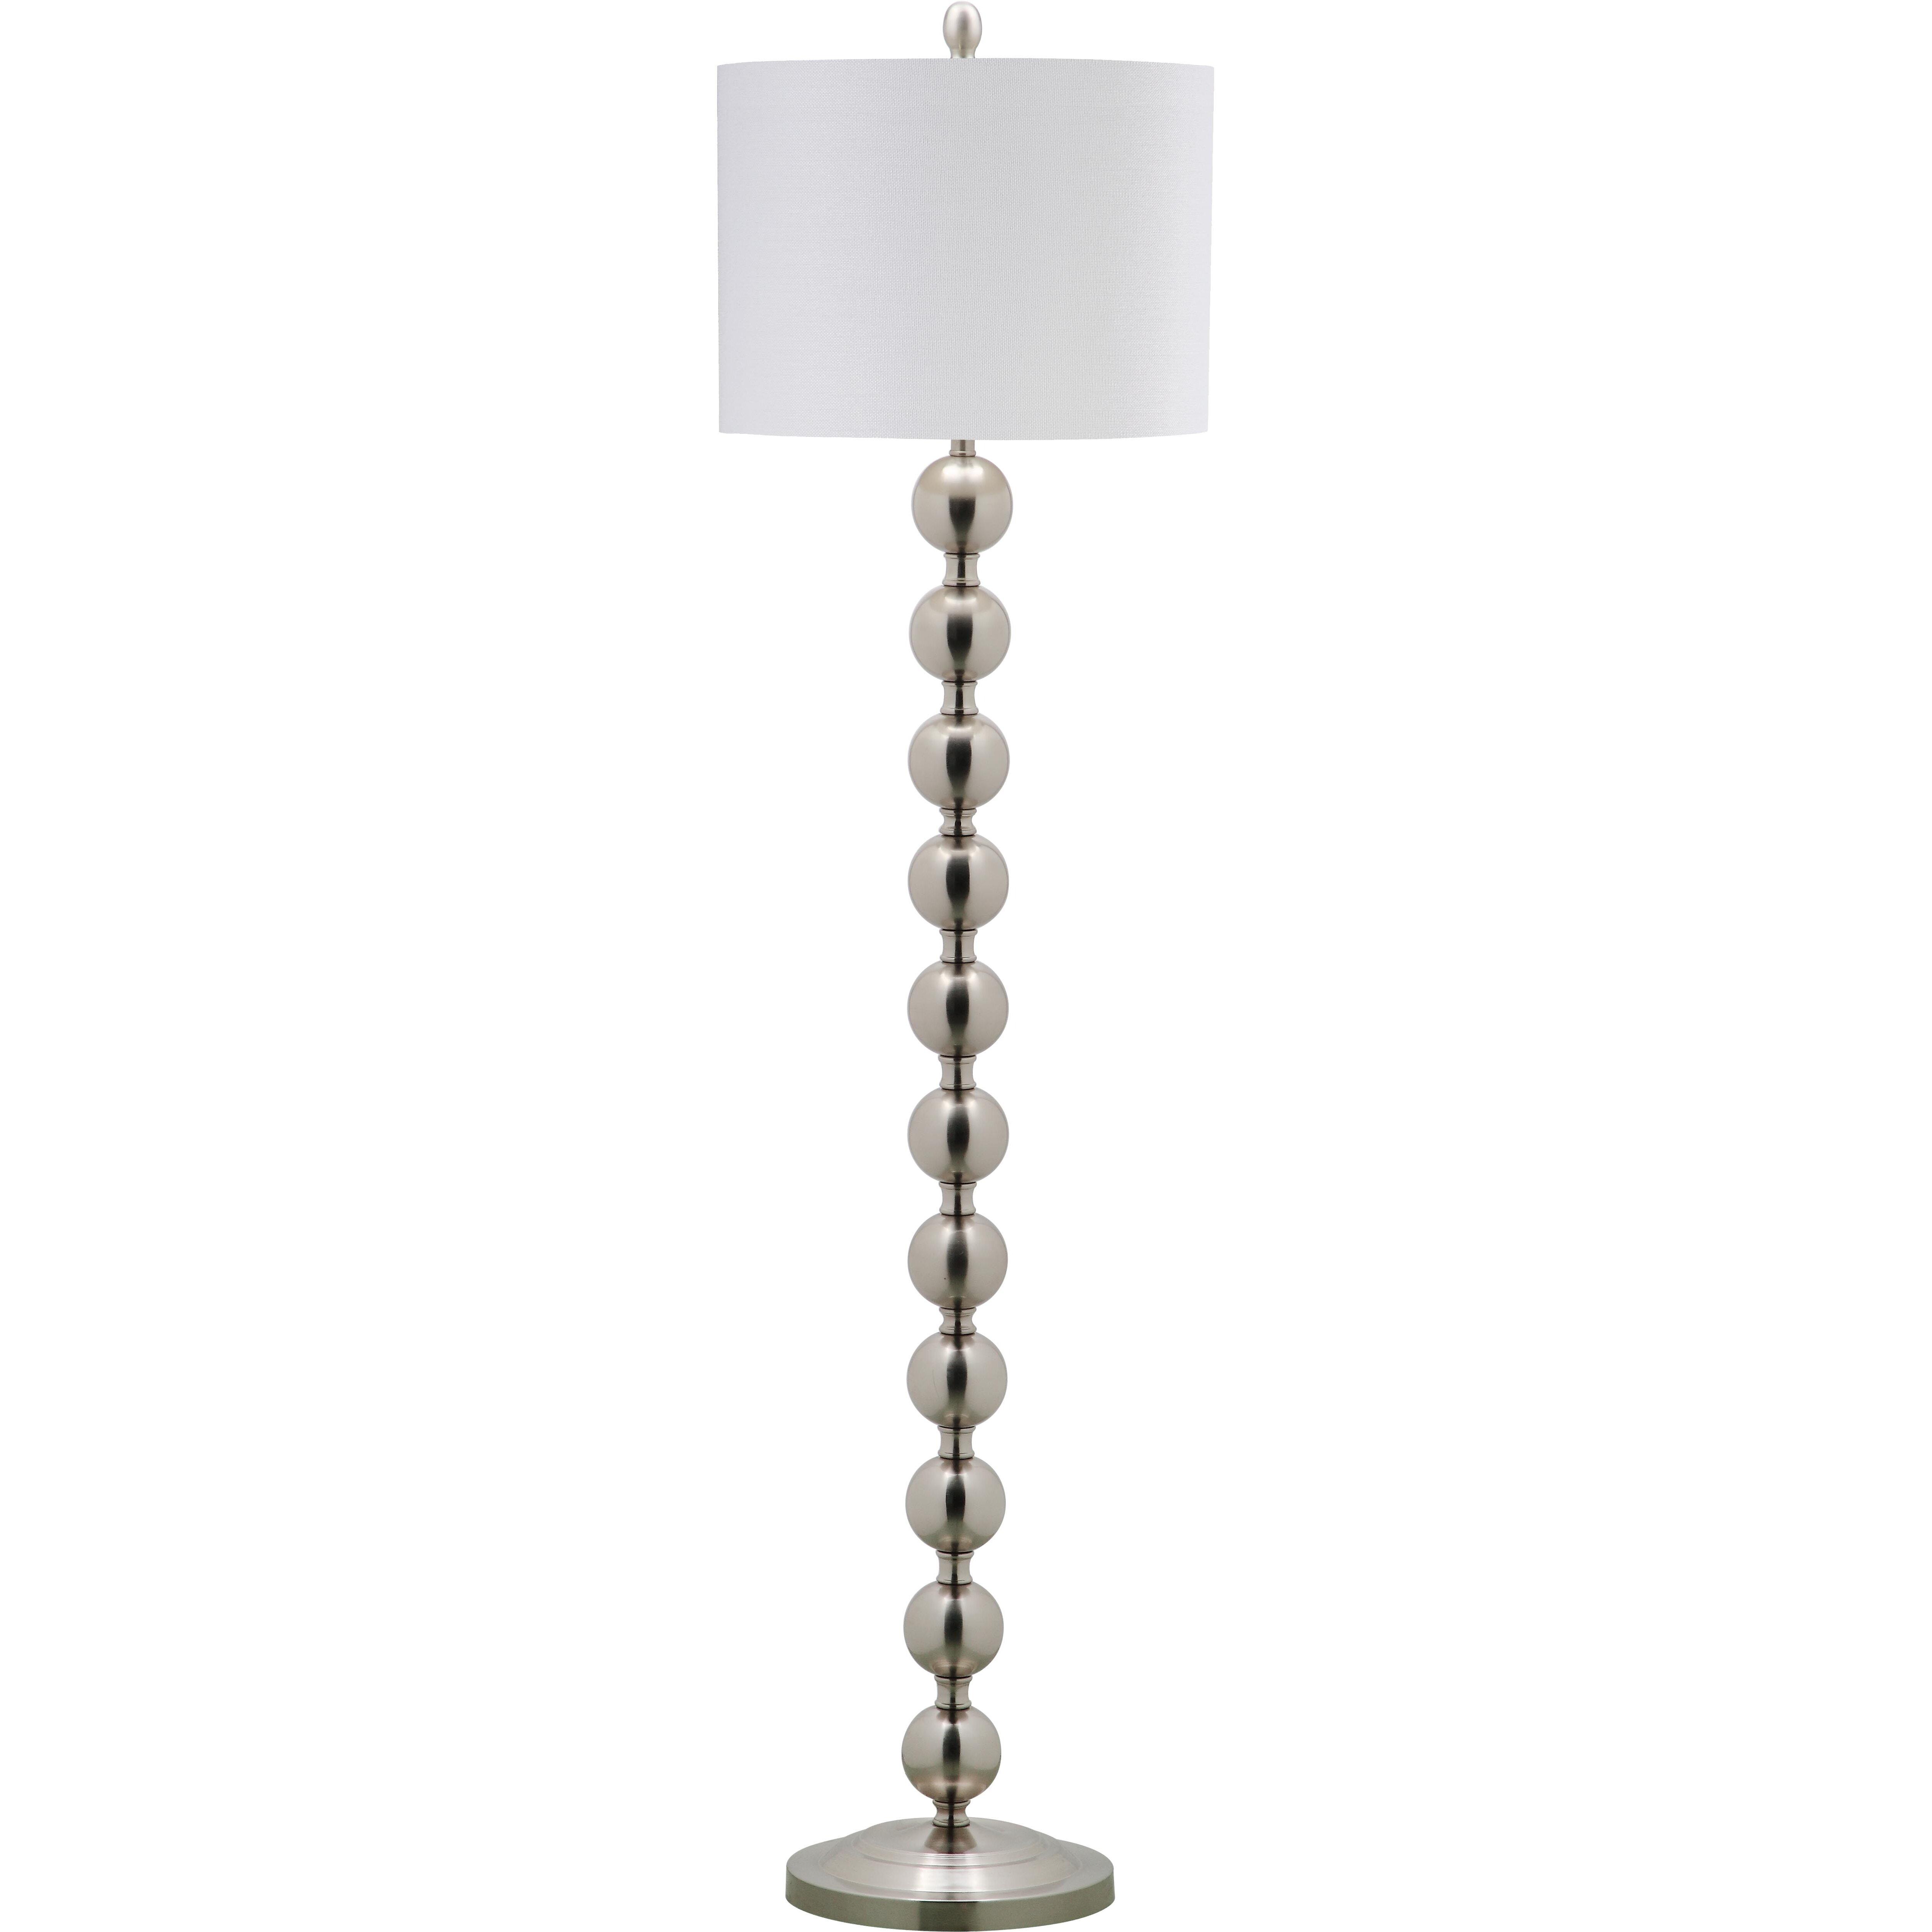 Safavieh Reflections Stacked Ball 58 5 Quot Floor Lamp Amp Reviews Wayfair